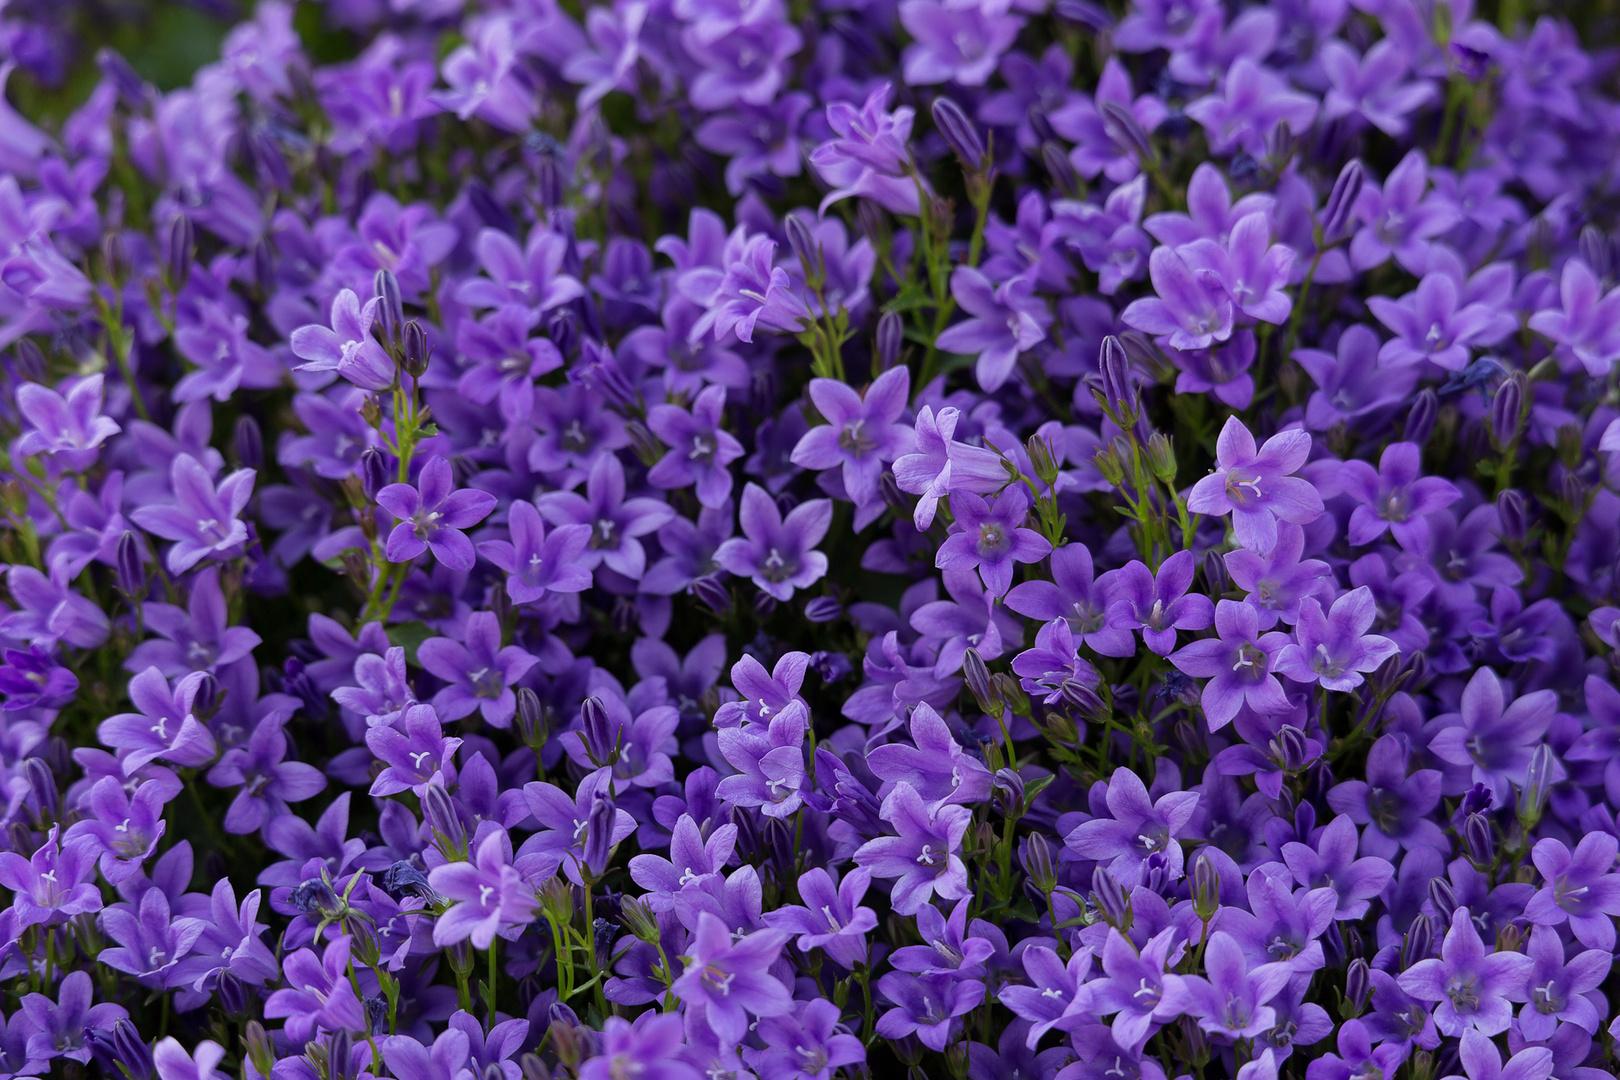 lila blumen foto bild pflanzen pilze flechten bl ten kleinpflanzen gartenpflanzen. Black Bedroom Furniture Sets. Home Design Ideas